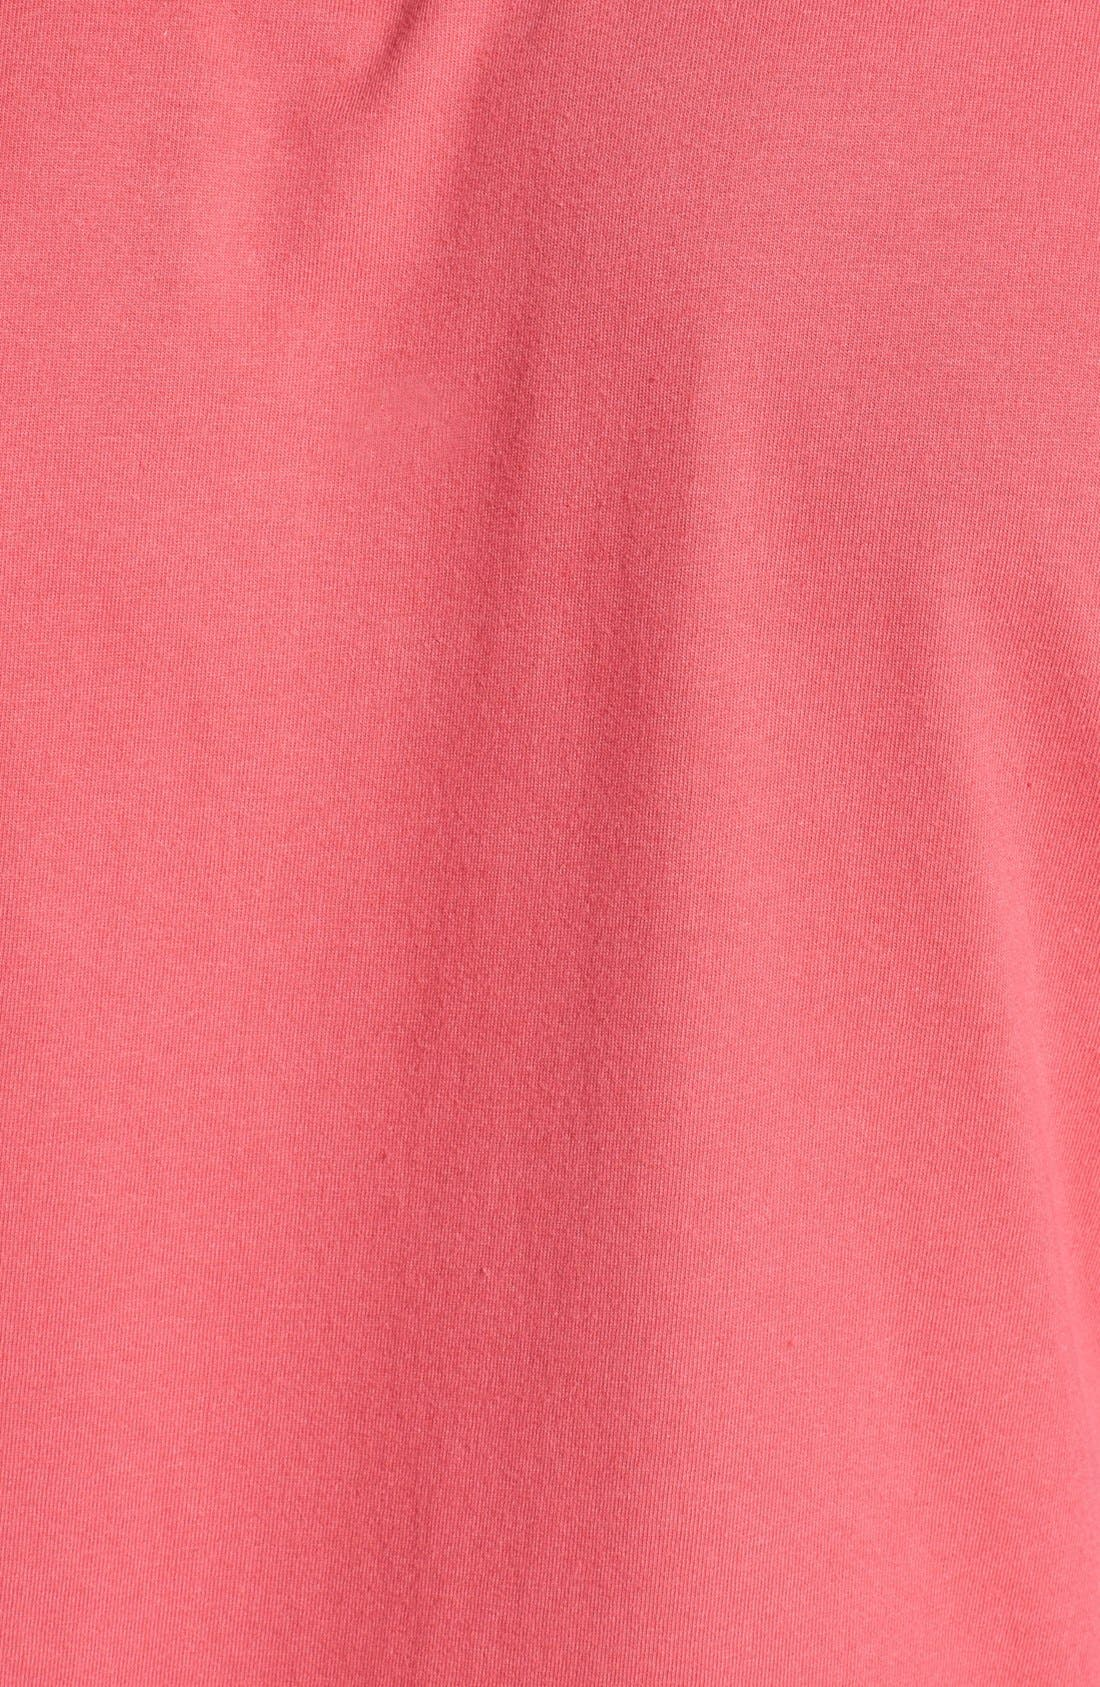 Alternate Image 3  - Red Jacket 'Phillies - Reversal' T-Shirt